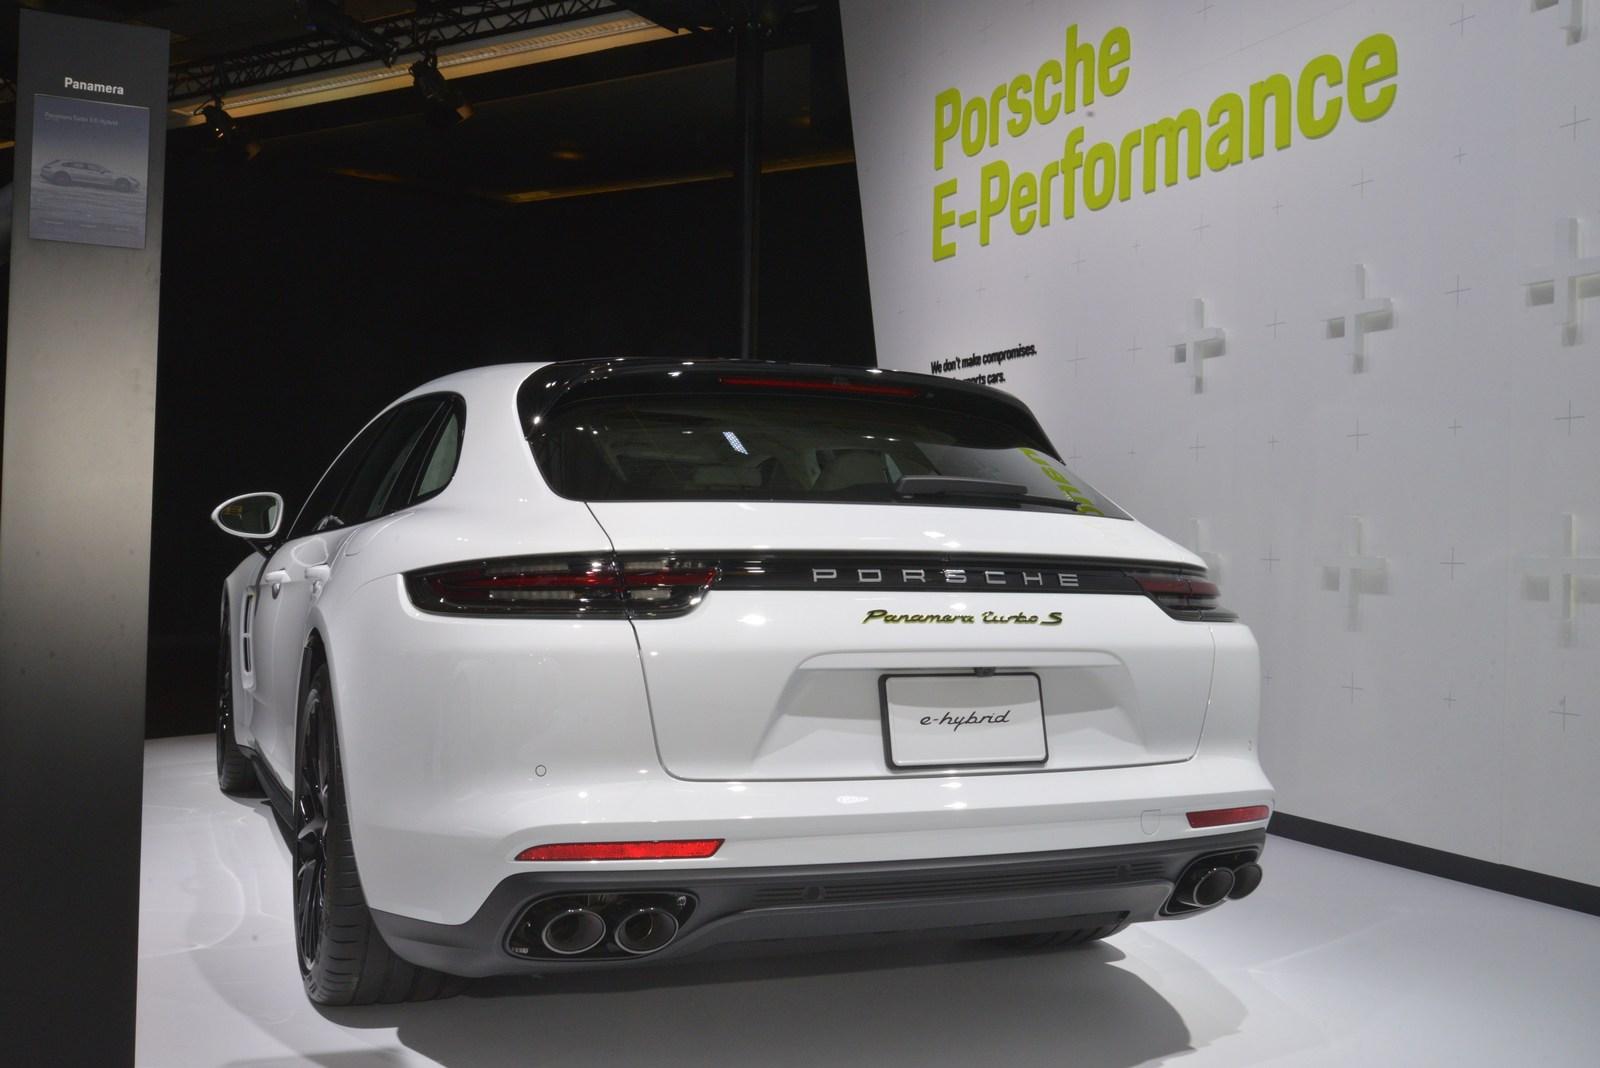 Porsches Panamera Hybrid Wagon Is An Impressive Piece Of